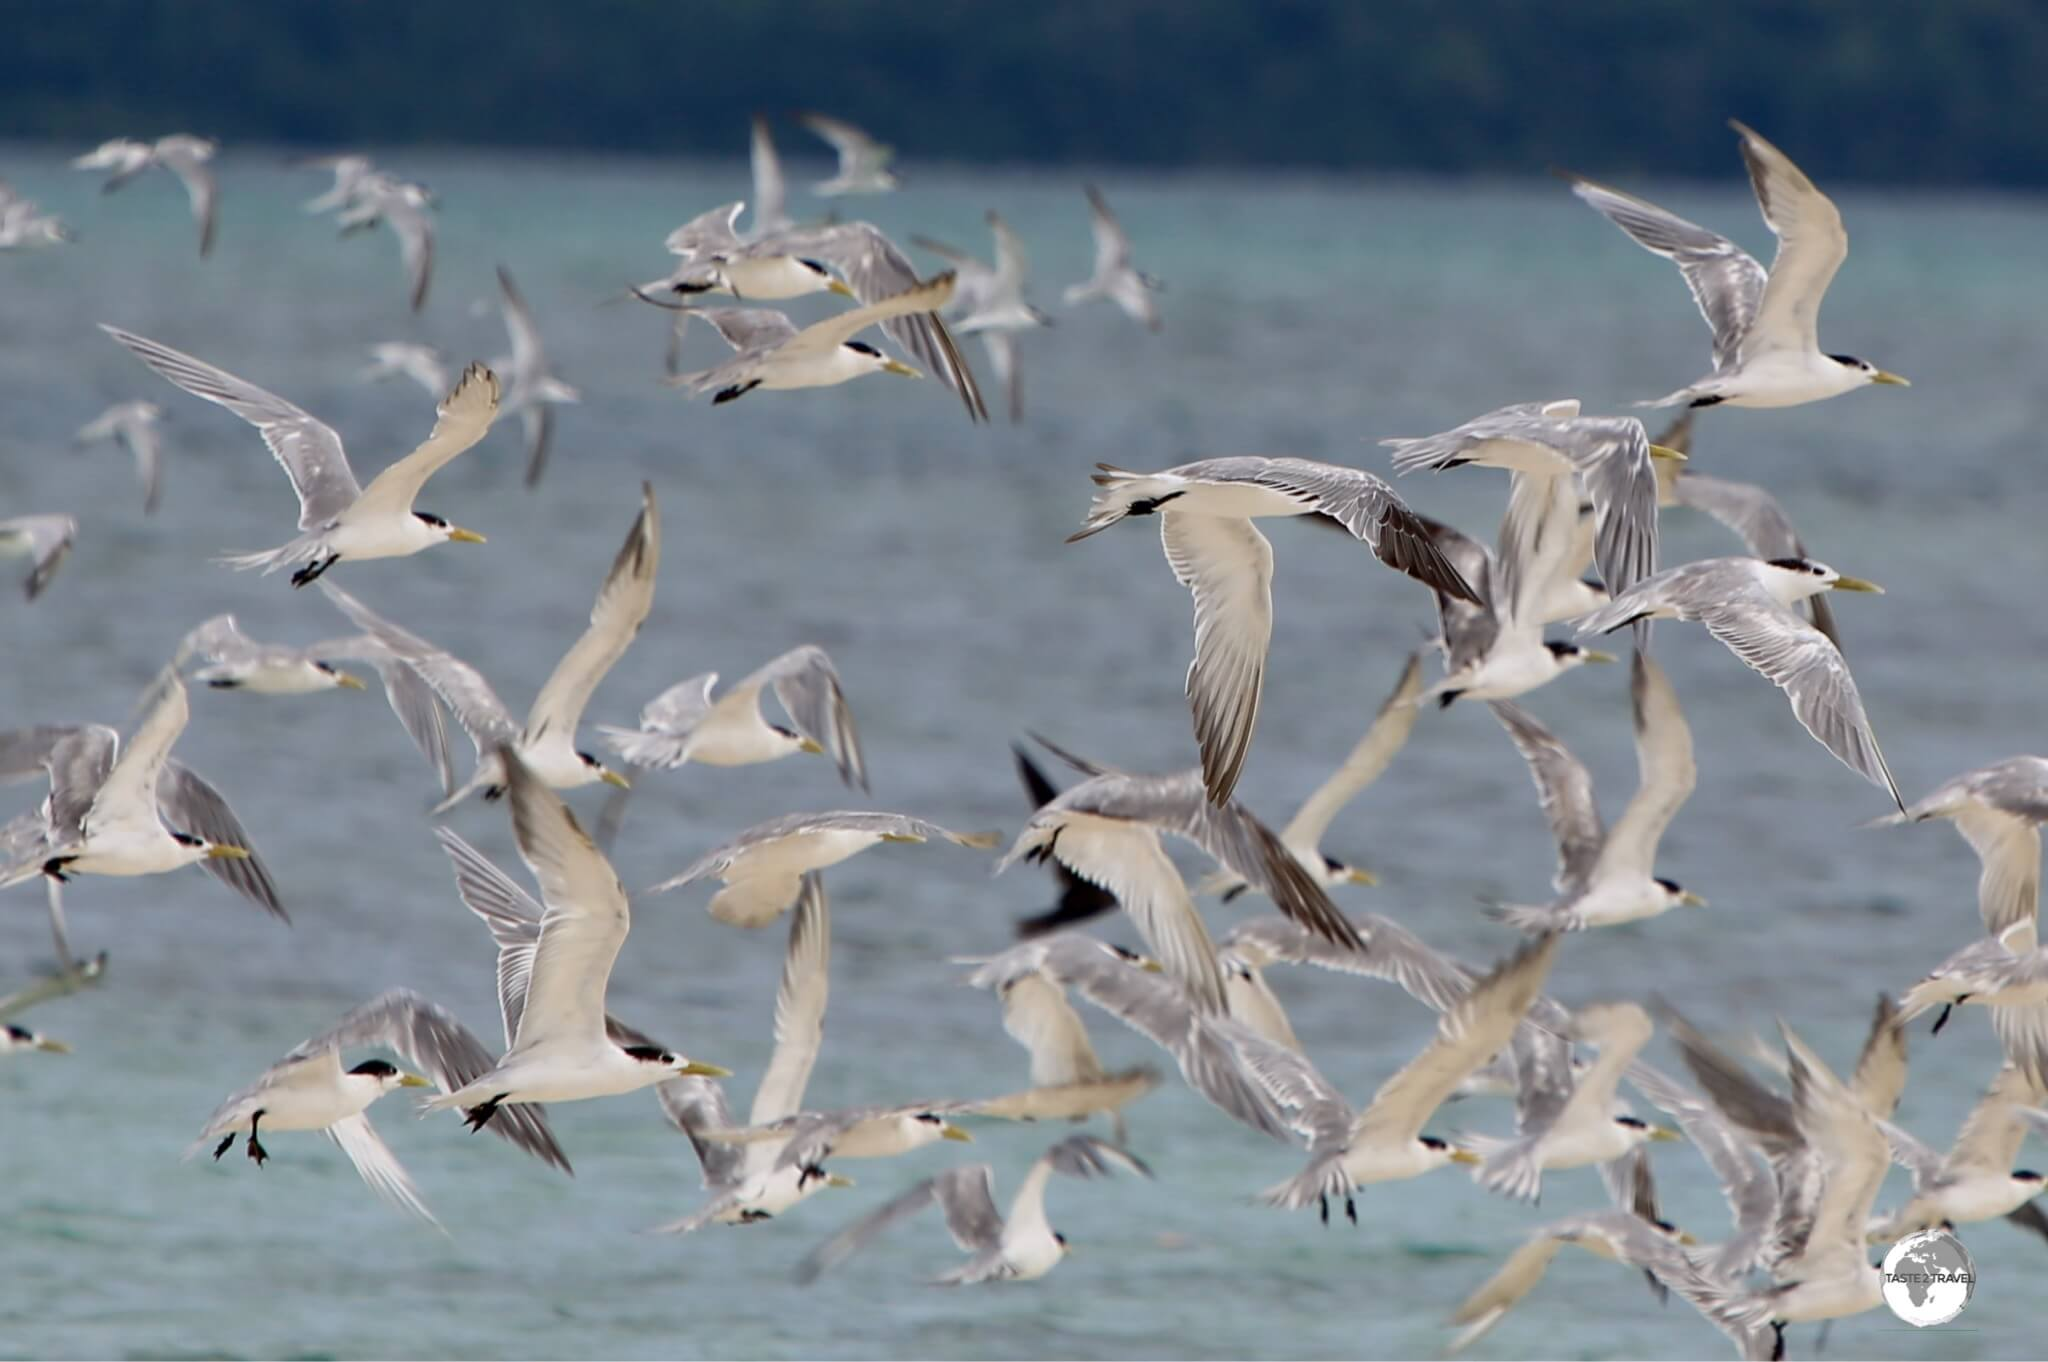 Seagulls at Munda.